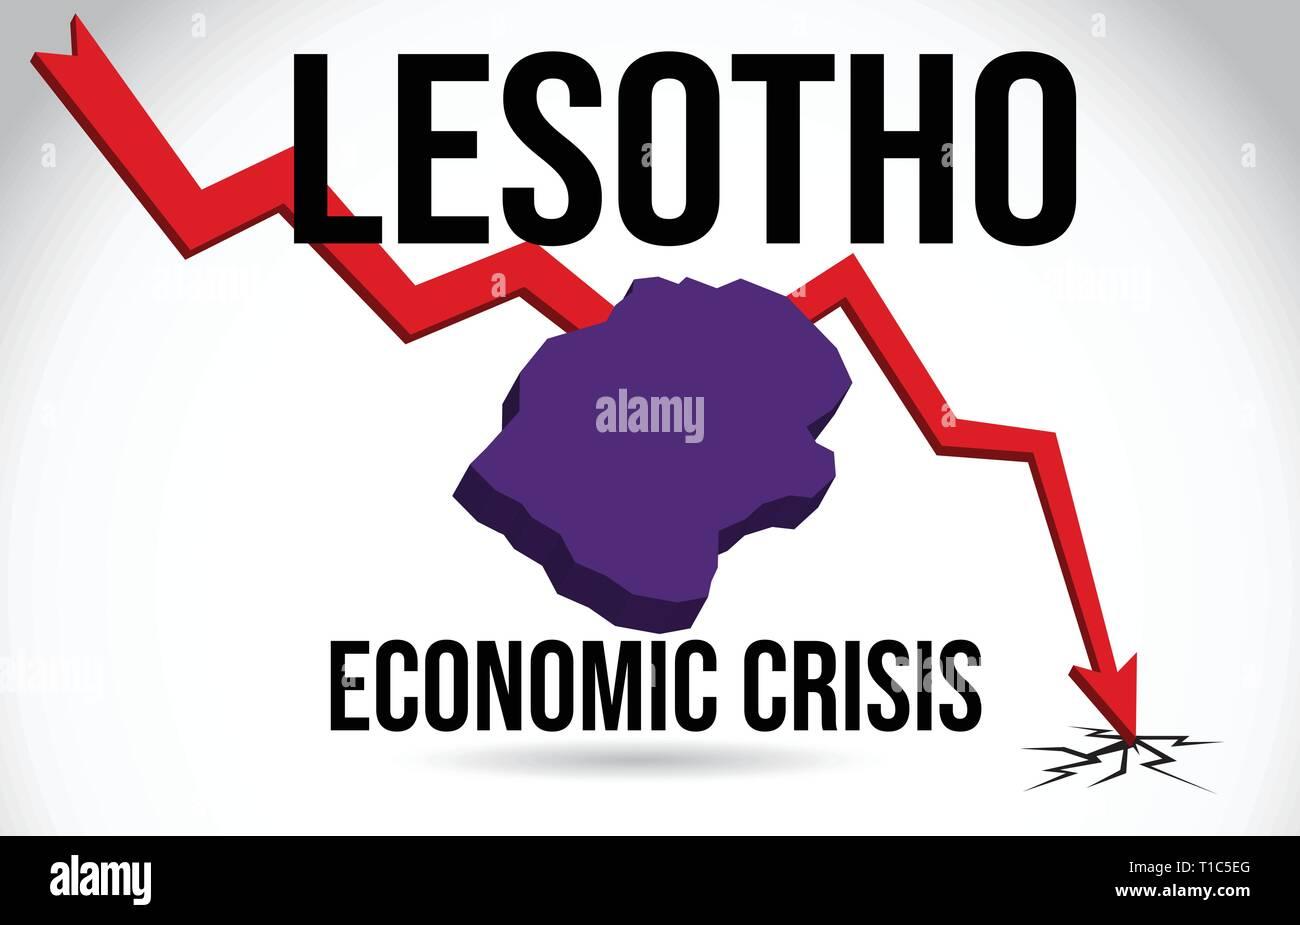 Lesotho Map Financial Crisis Economic Collapse Market Crash Global Meltdown Vector Illustration. - Stock Vector